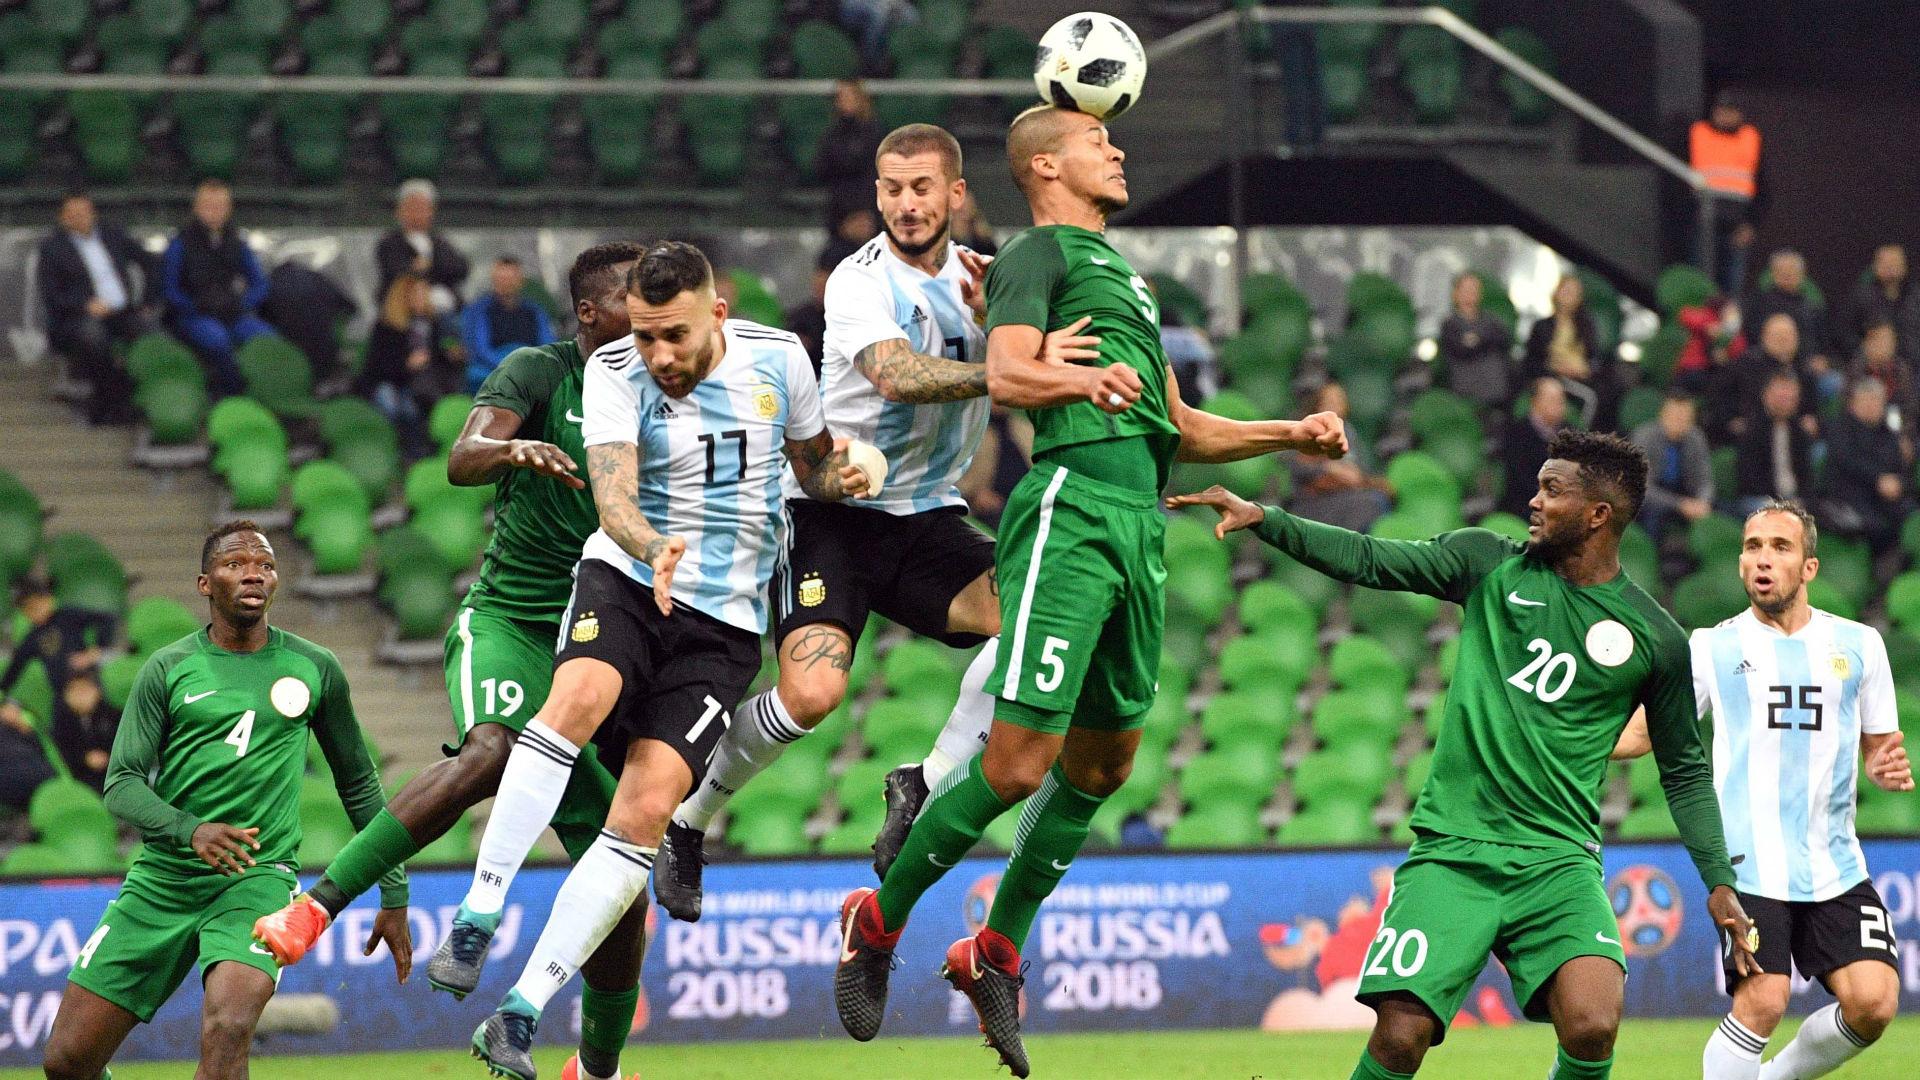 nigeria match the most difficult for croatia slaven